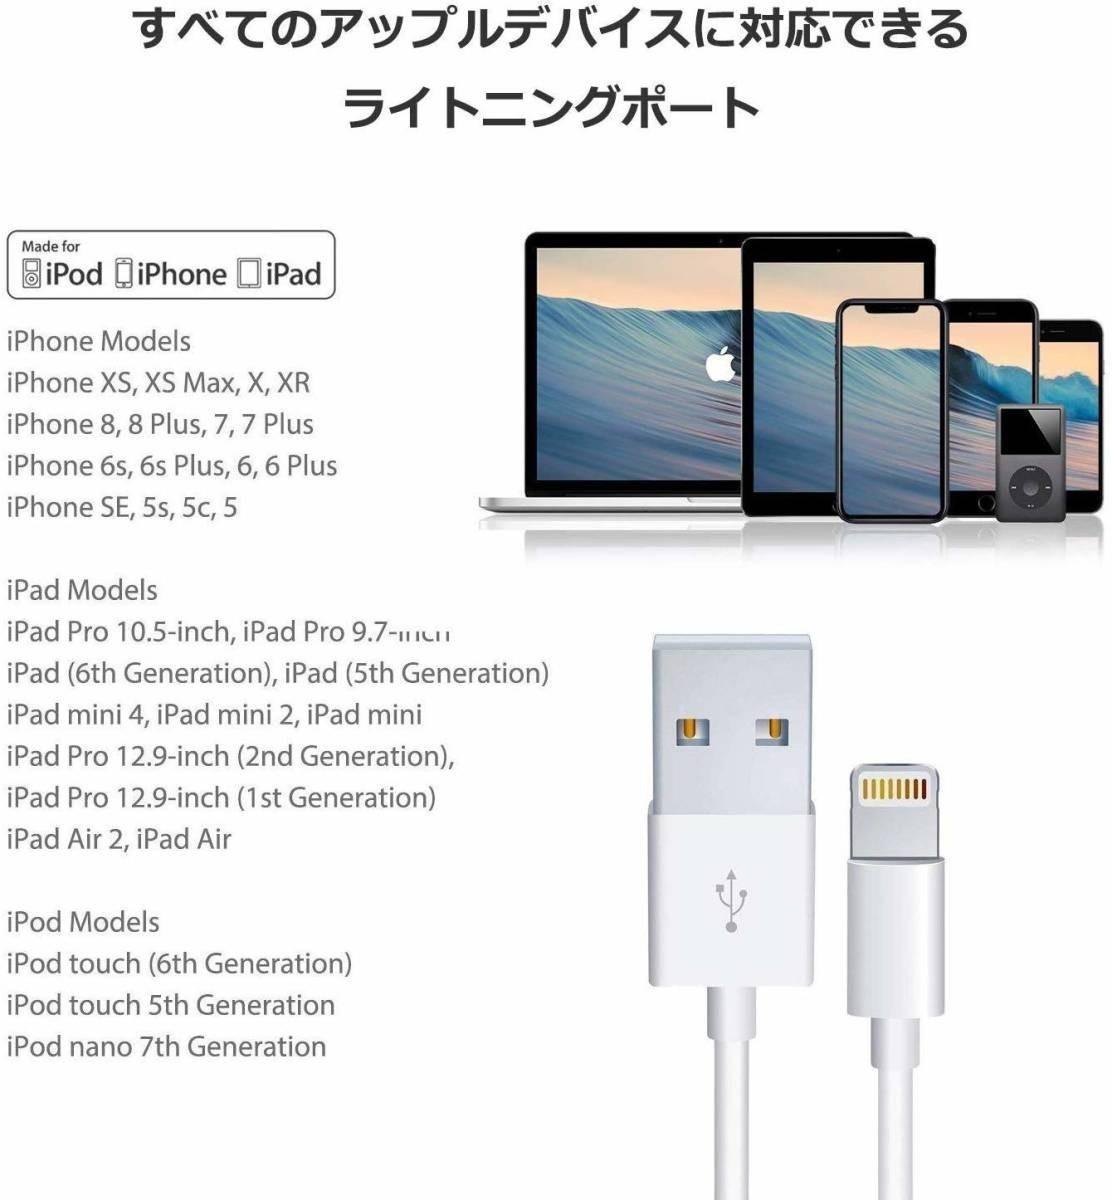 iPhone急速充電ケーブル ライトニング 1m USBケーブル 3本セット